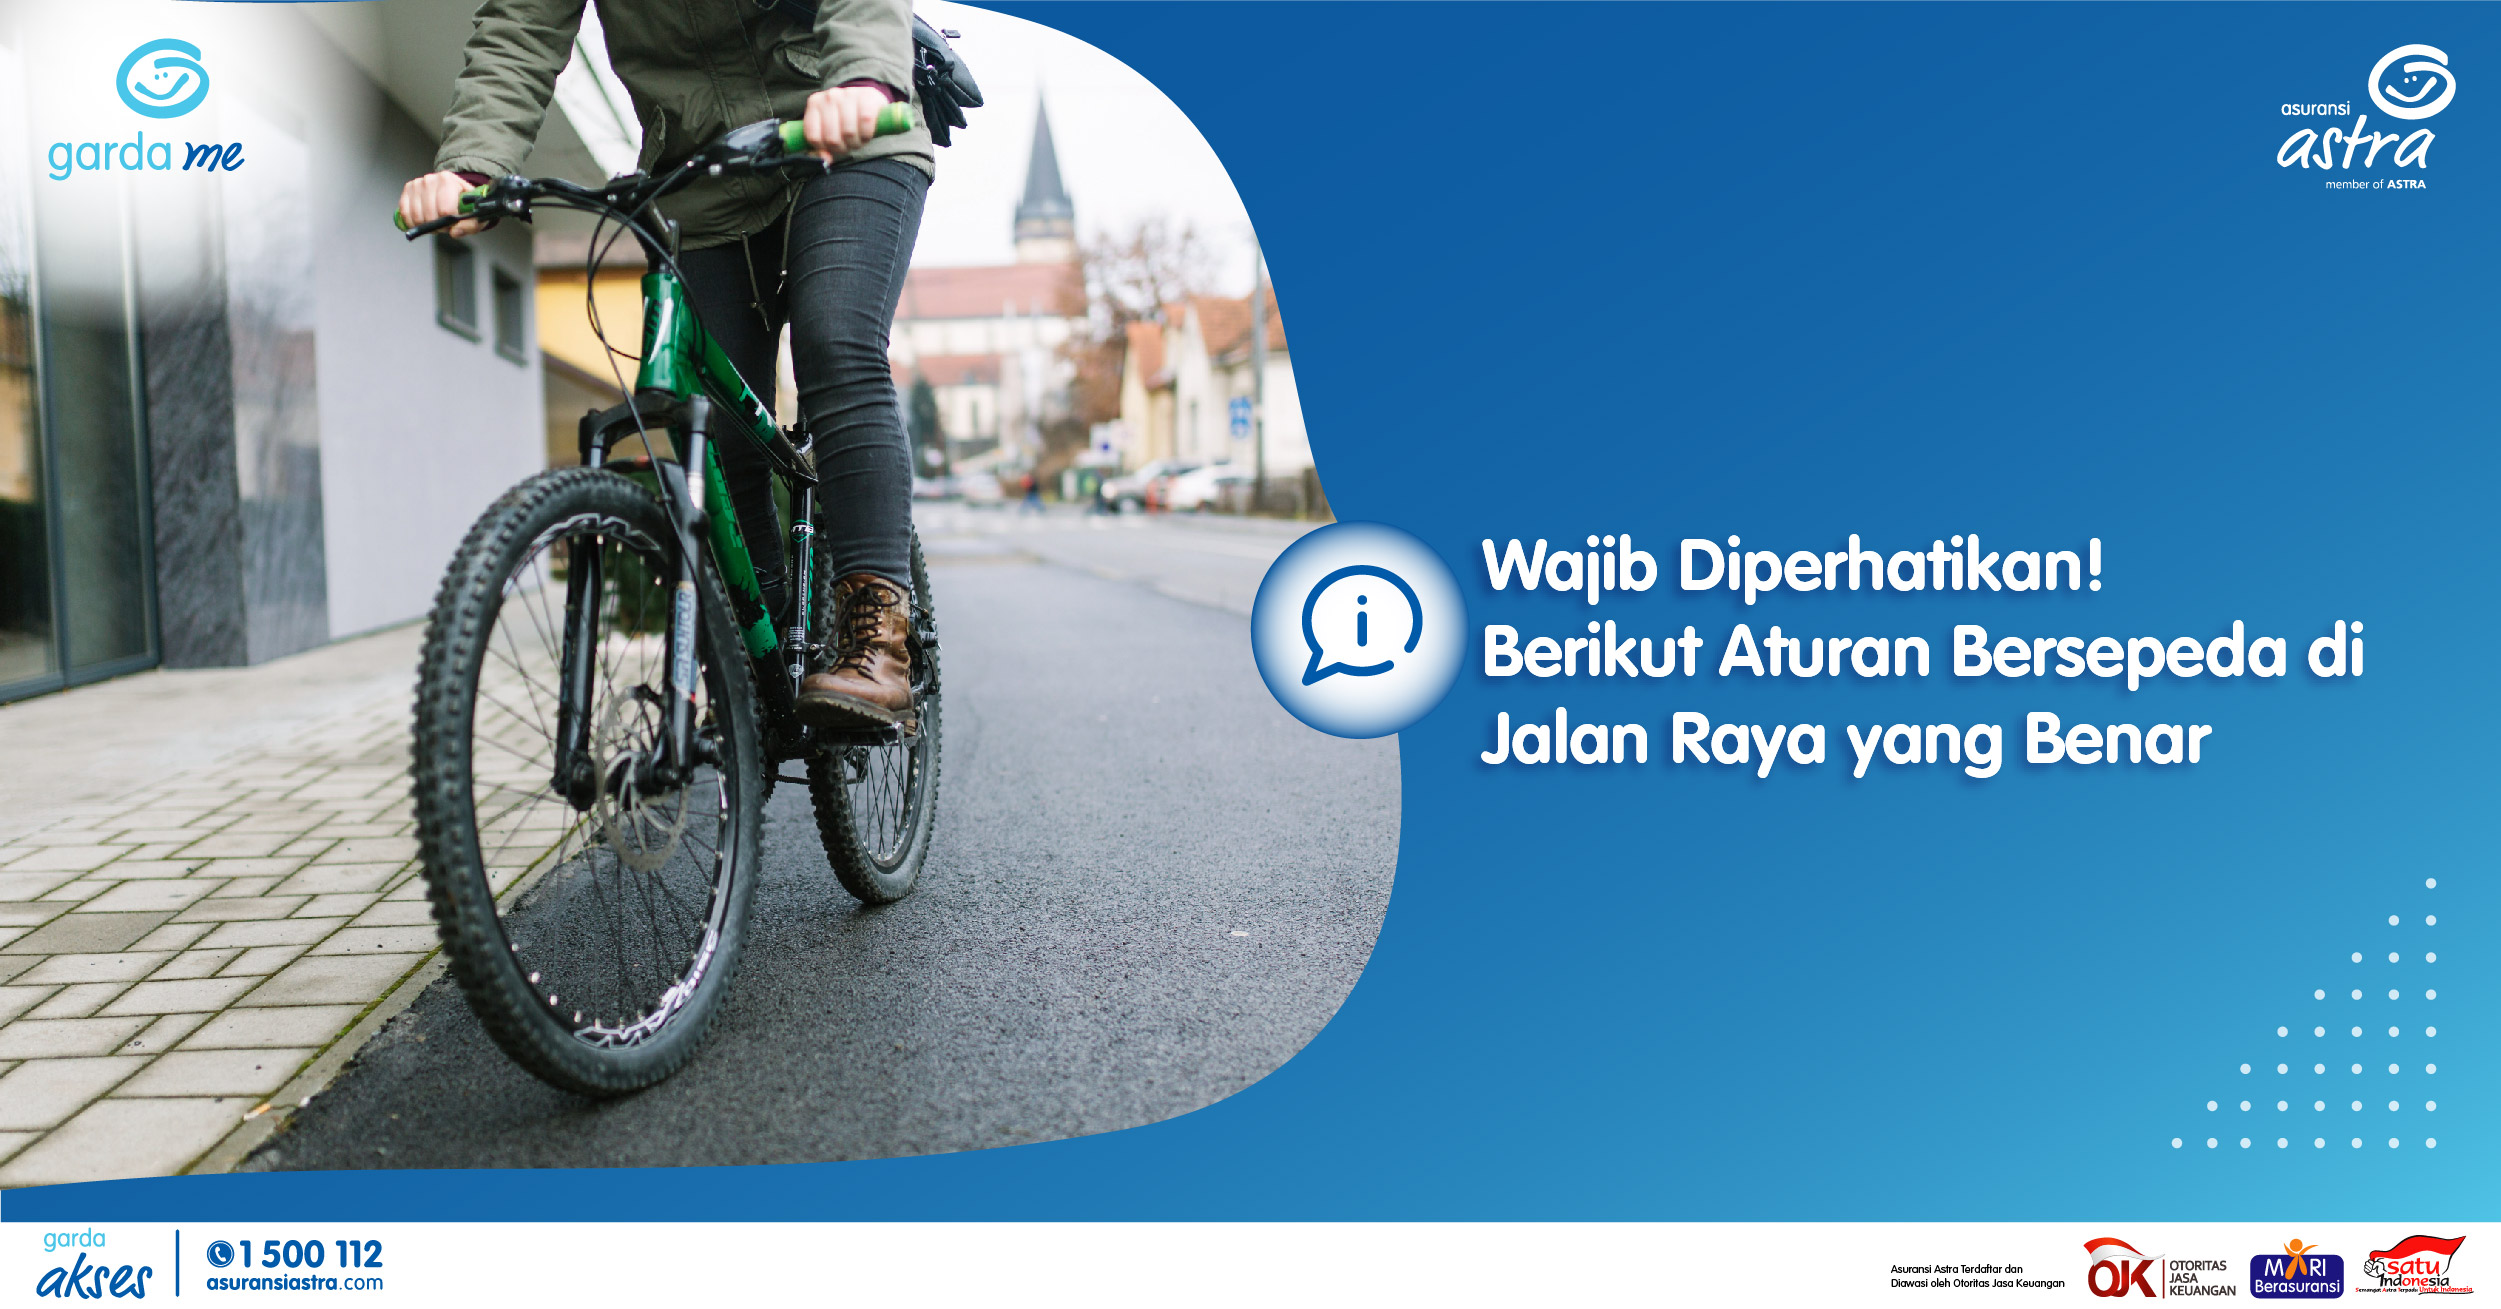 Wajib Diperhatikan! Berikut Aturan Bersepeda di Jalan Raya yang Benar